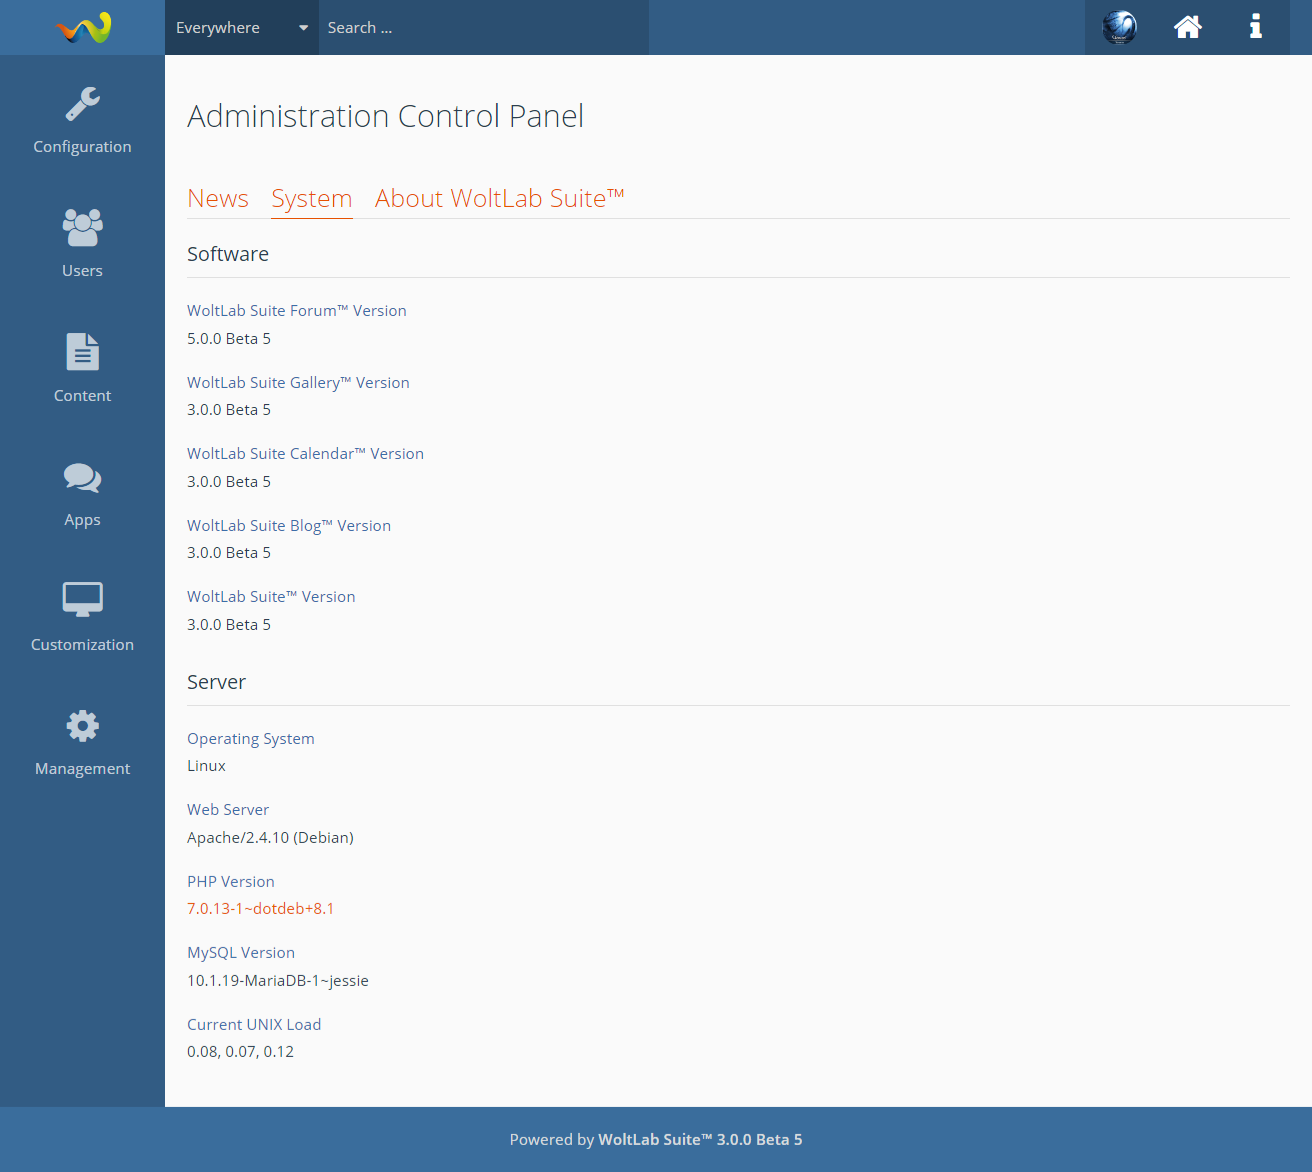 Admin Control Panel - WoltLab®